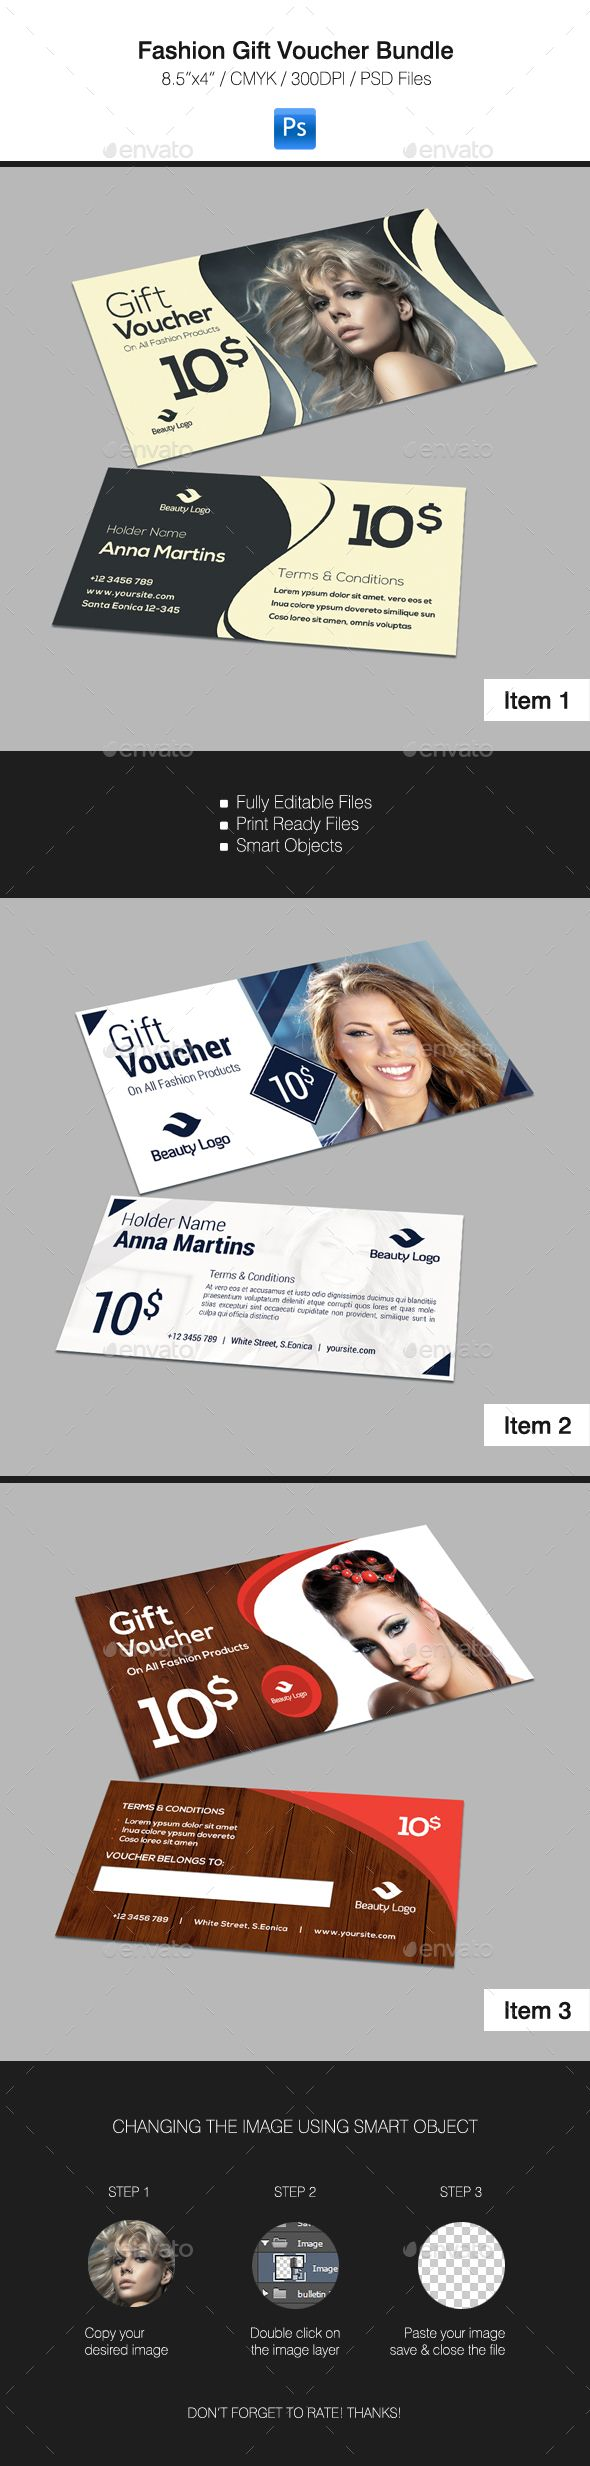 Gift Card #design Download: https://graphicriver.net/item/fashion-gift-voucher-bundle/16344276